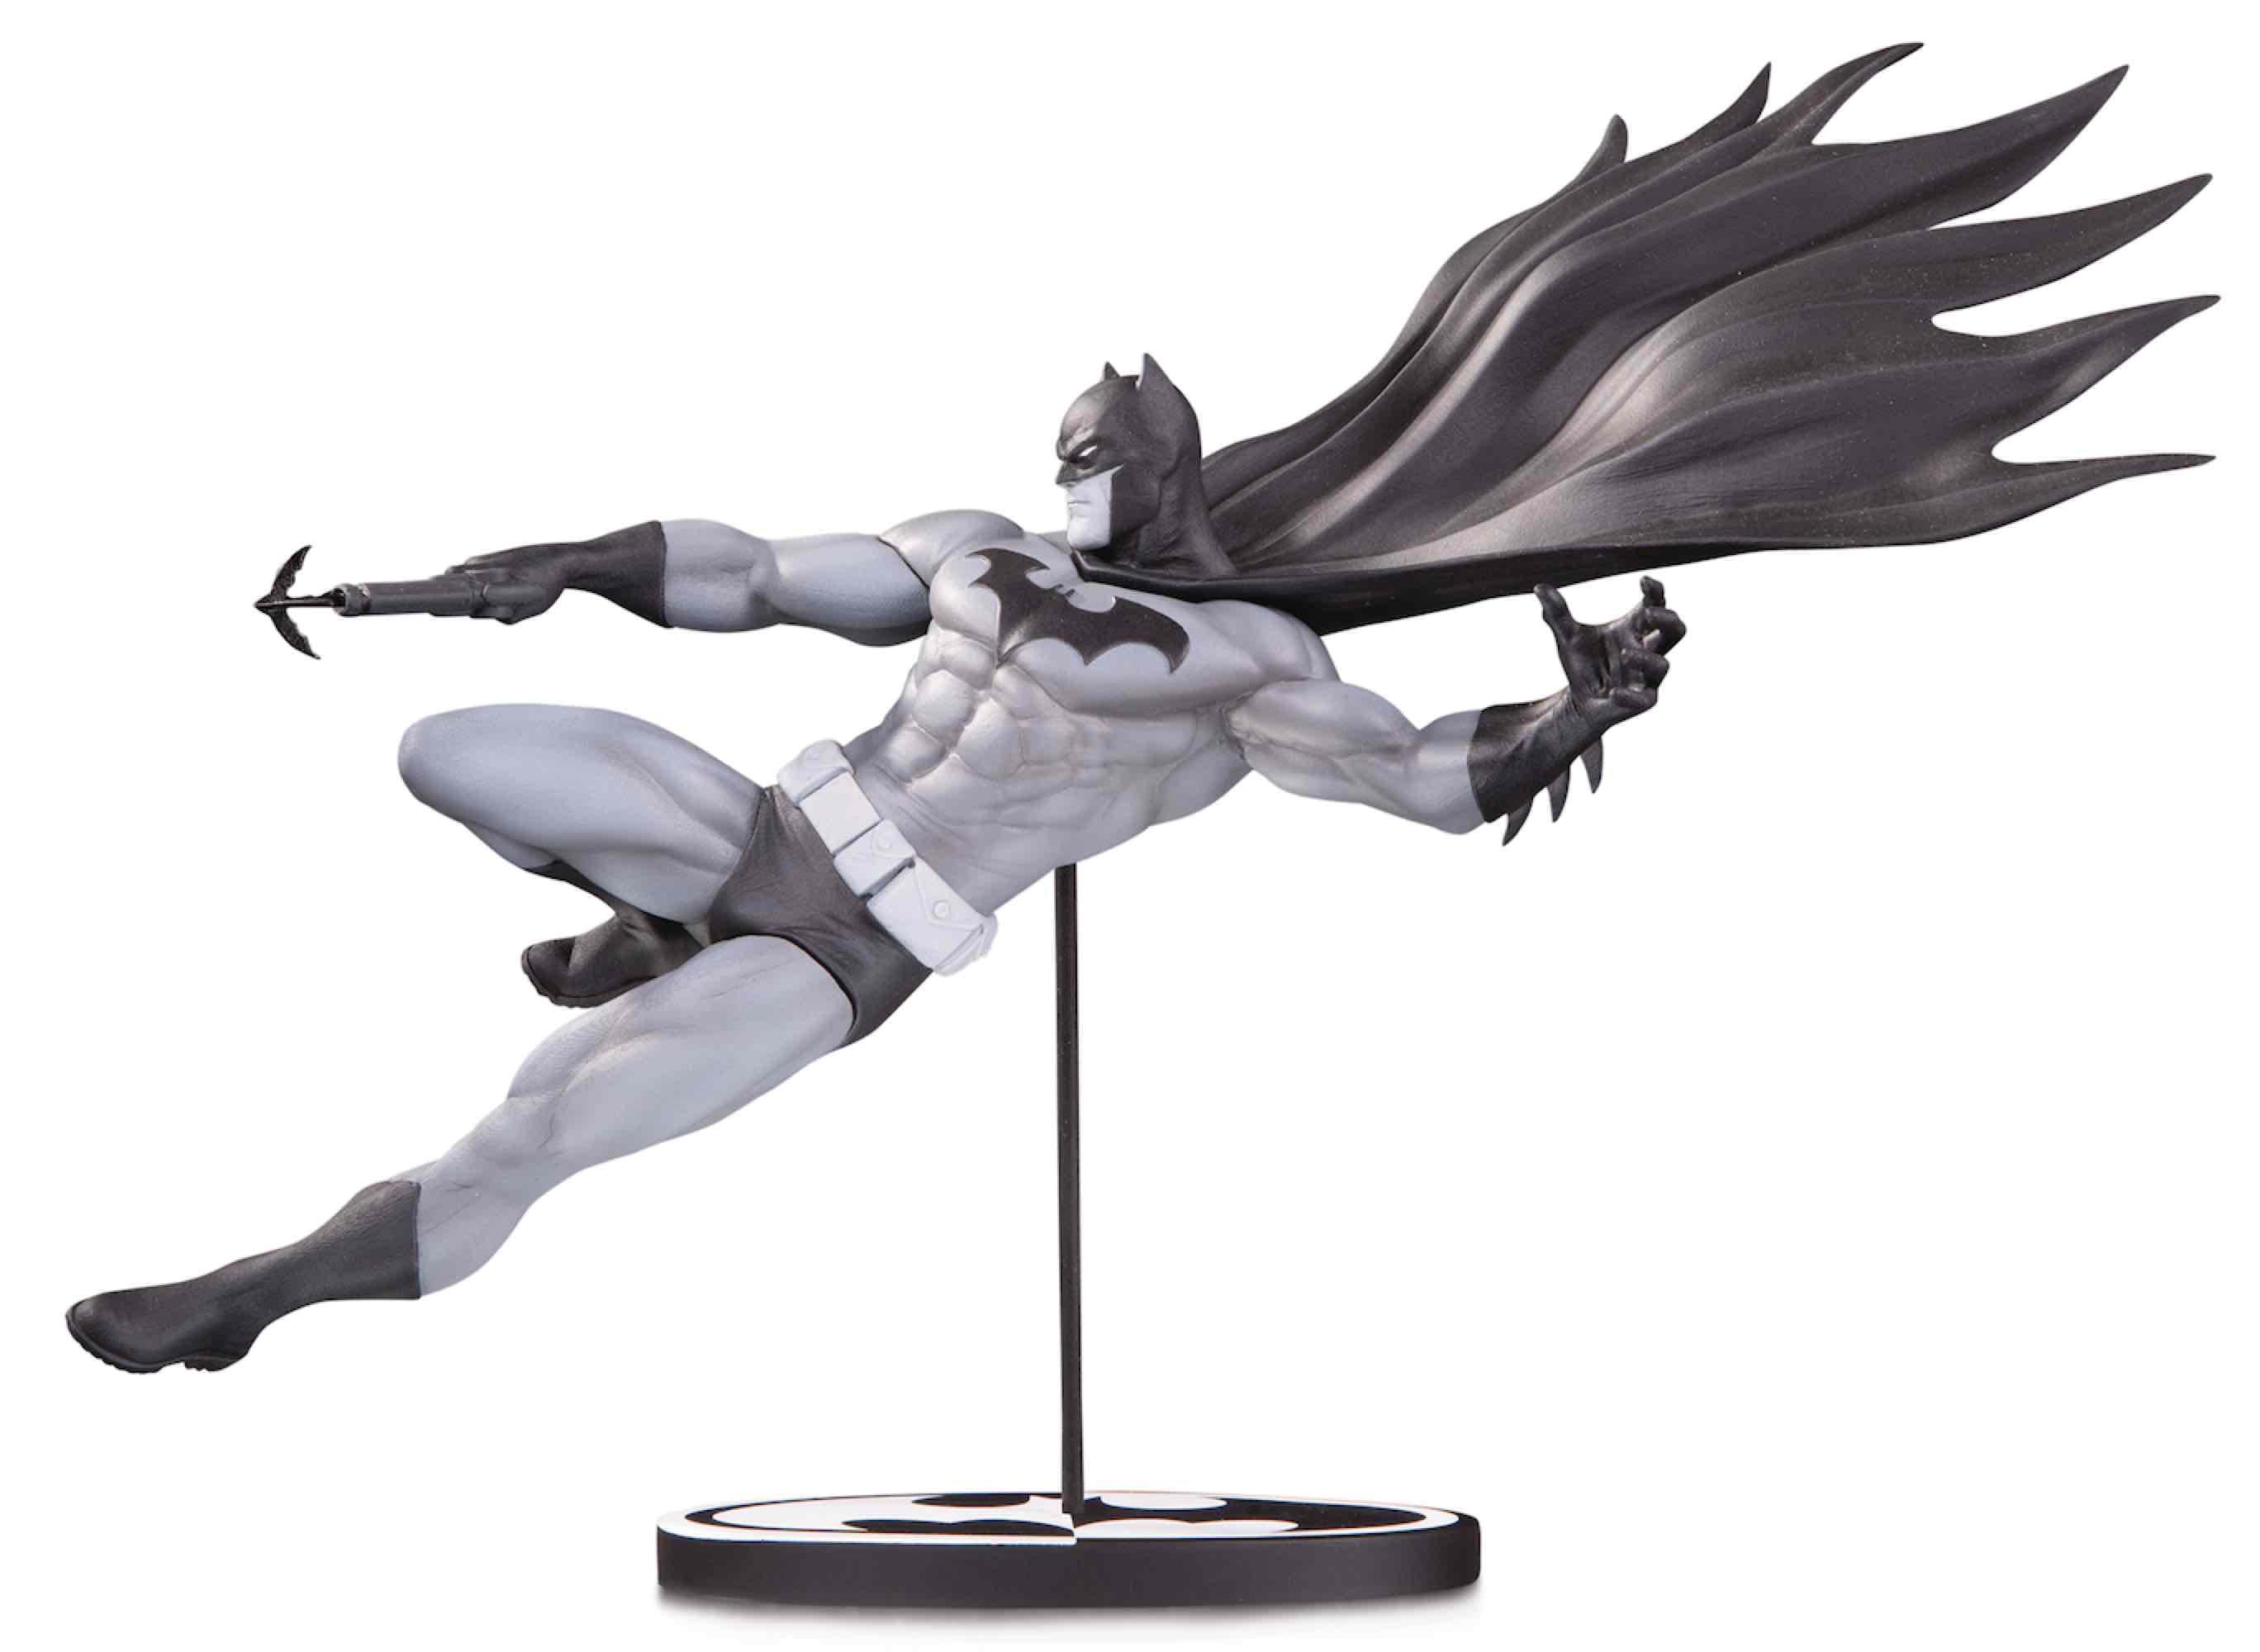 BATMAN B&W BLACK AND WHITE BY DOUG MAHNKE ESTATUA 18.5 CM BATMAN UNIVERSO DC